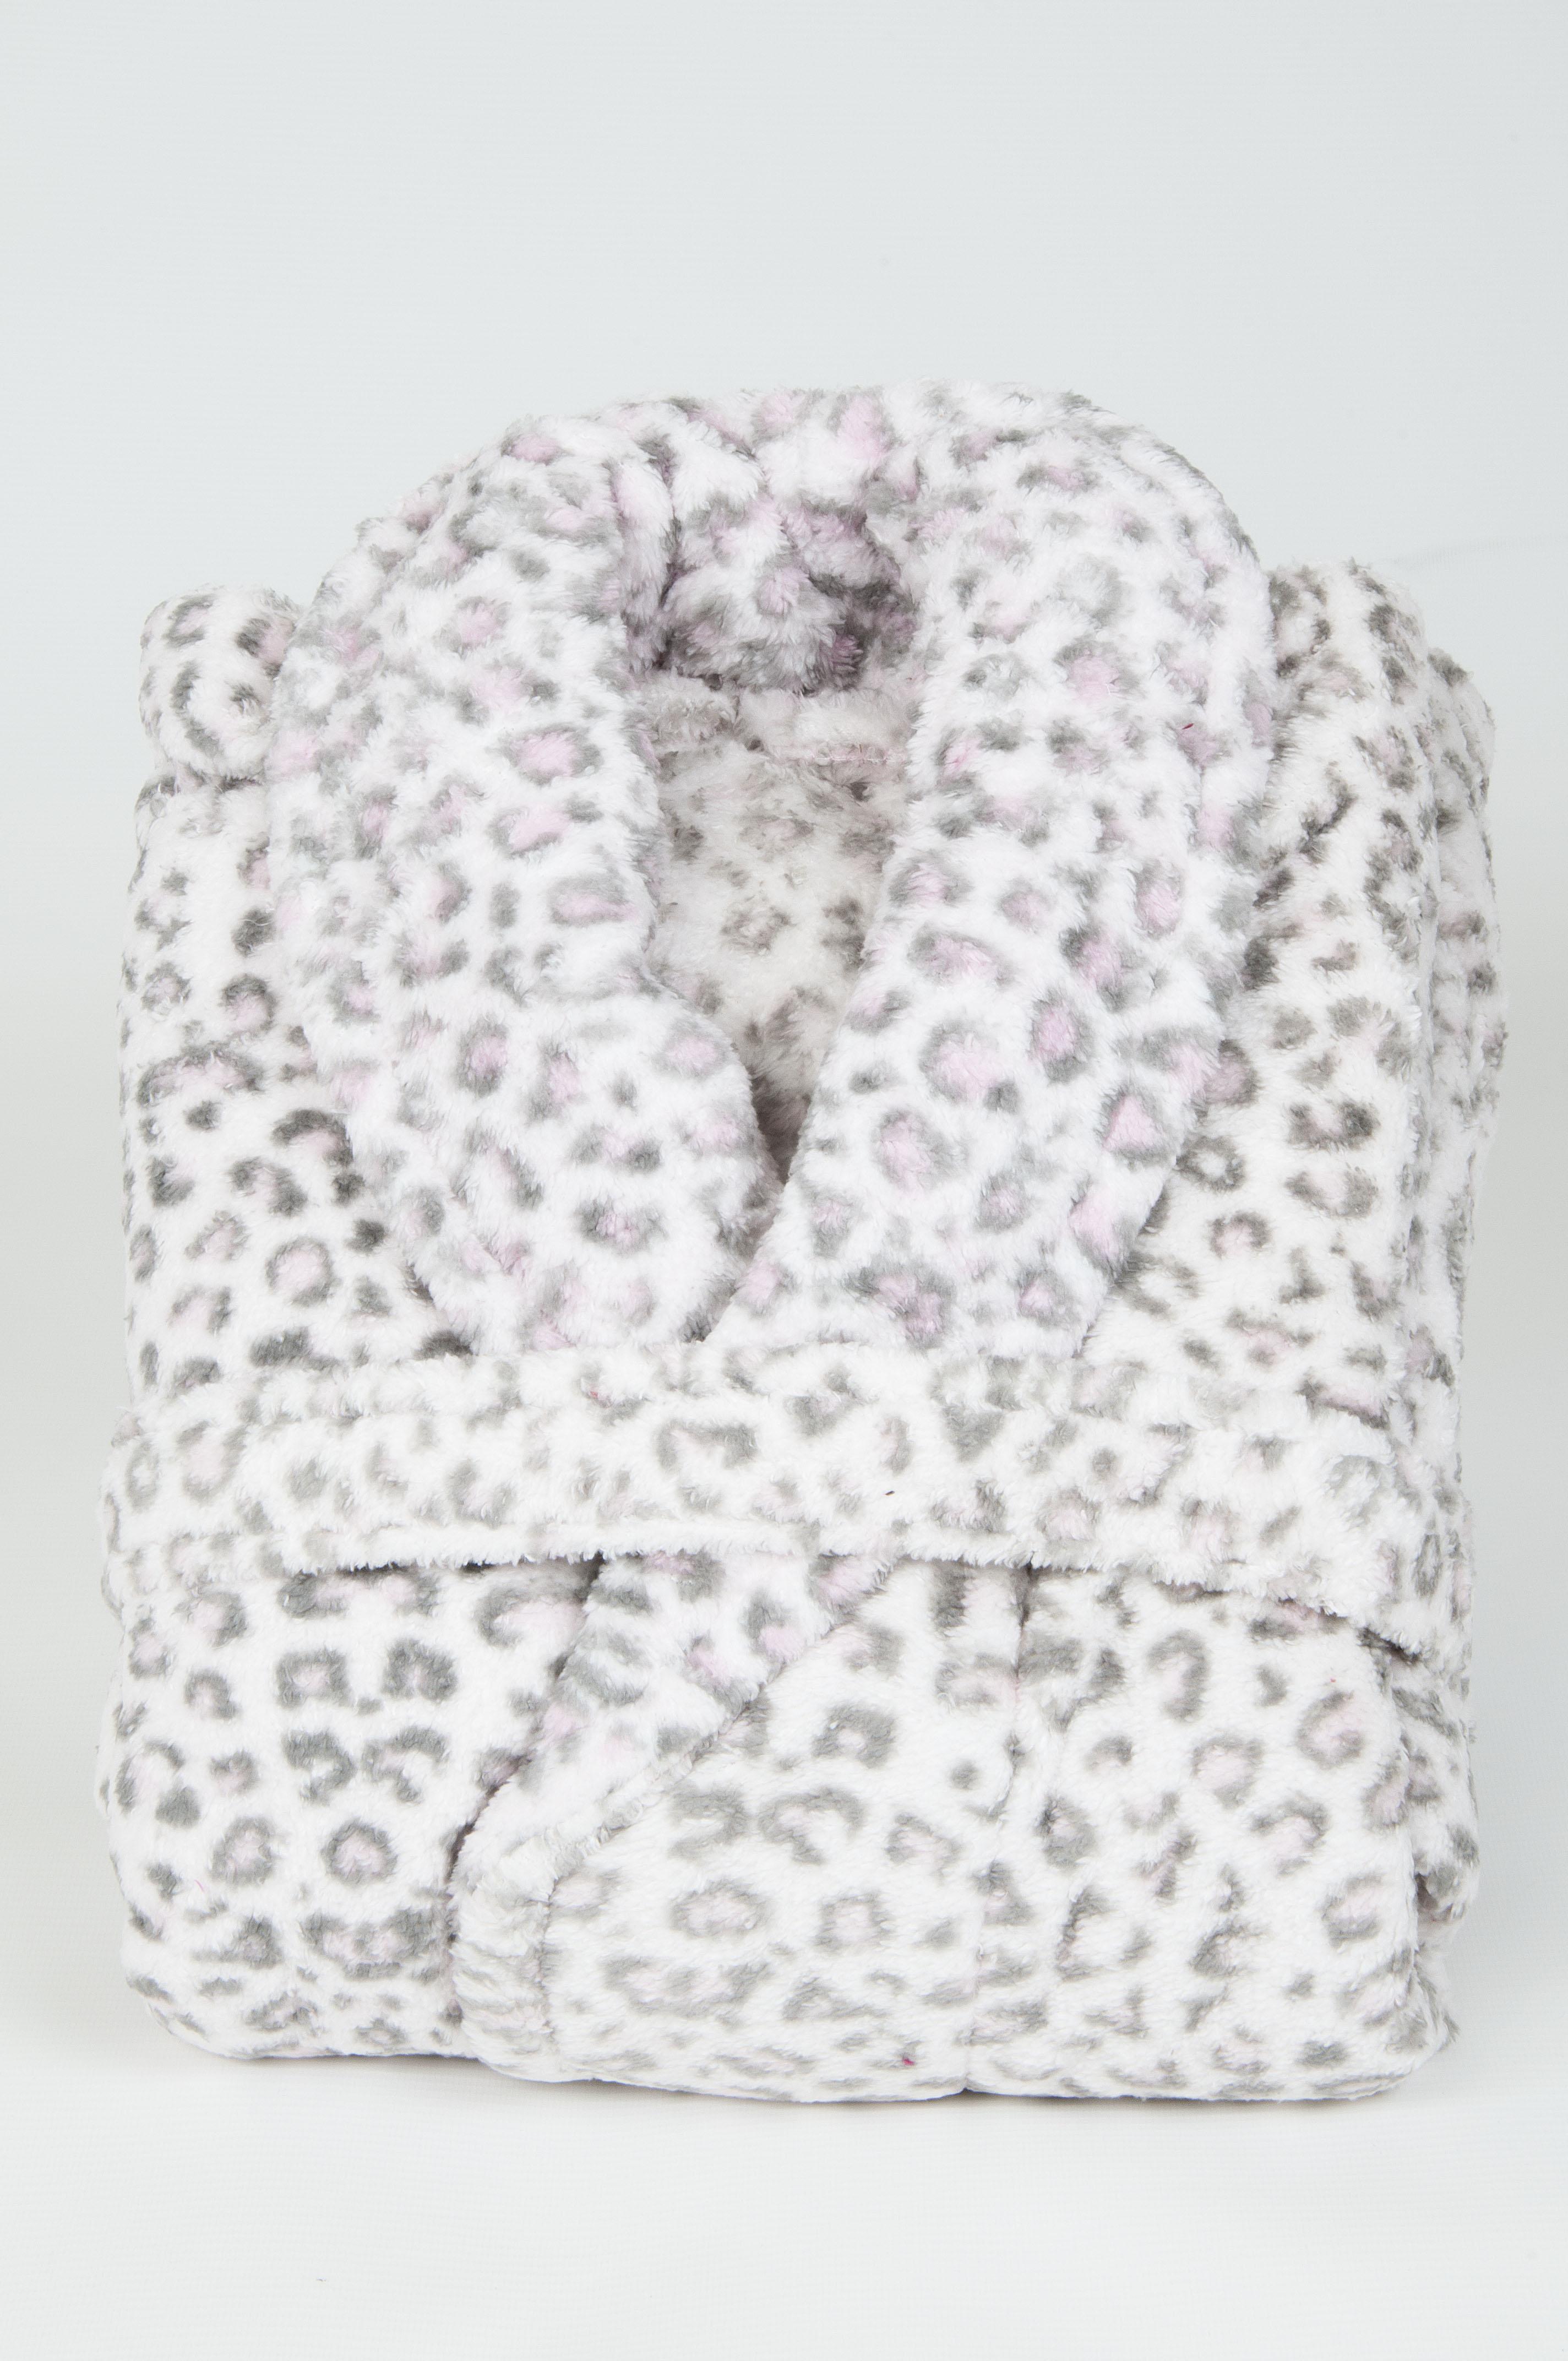 Light pink and white cheetah print - photo#18